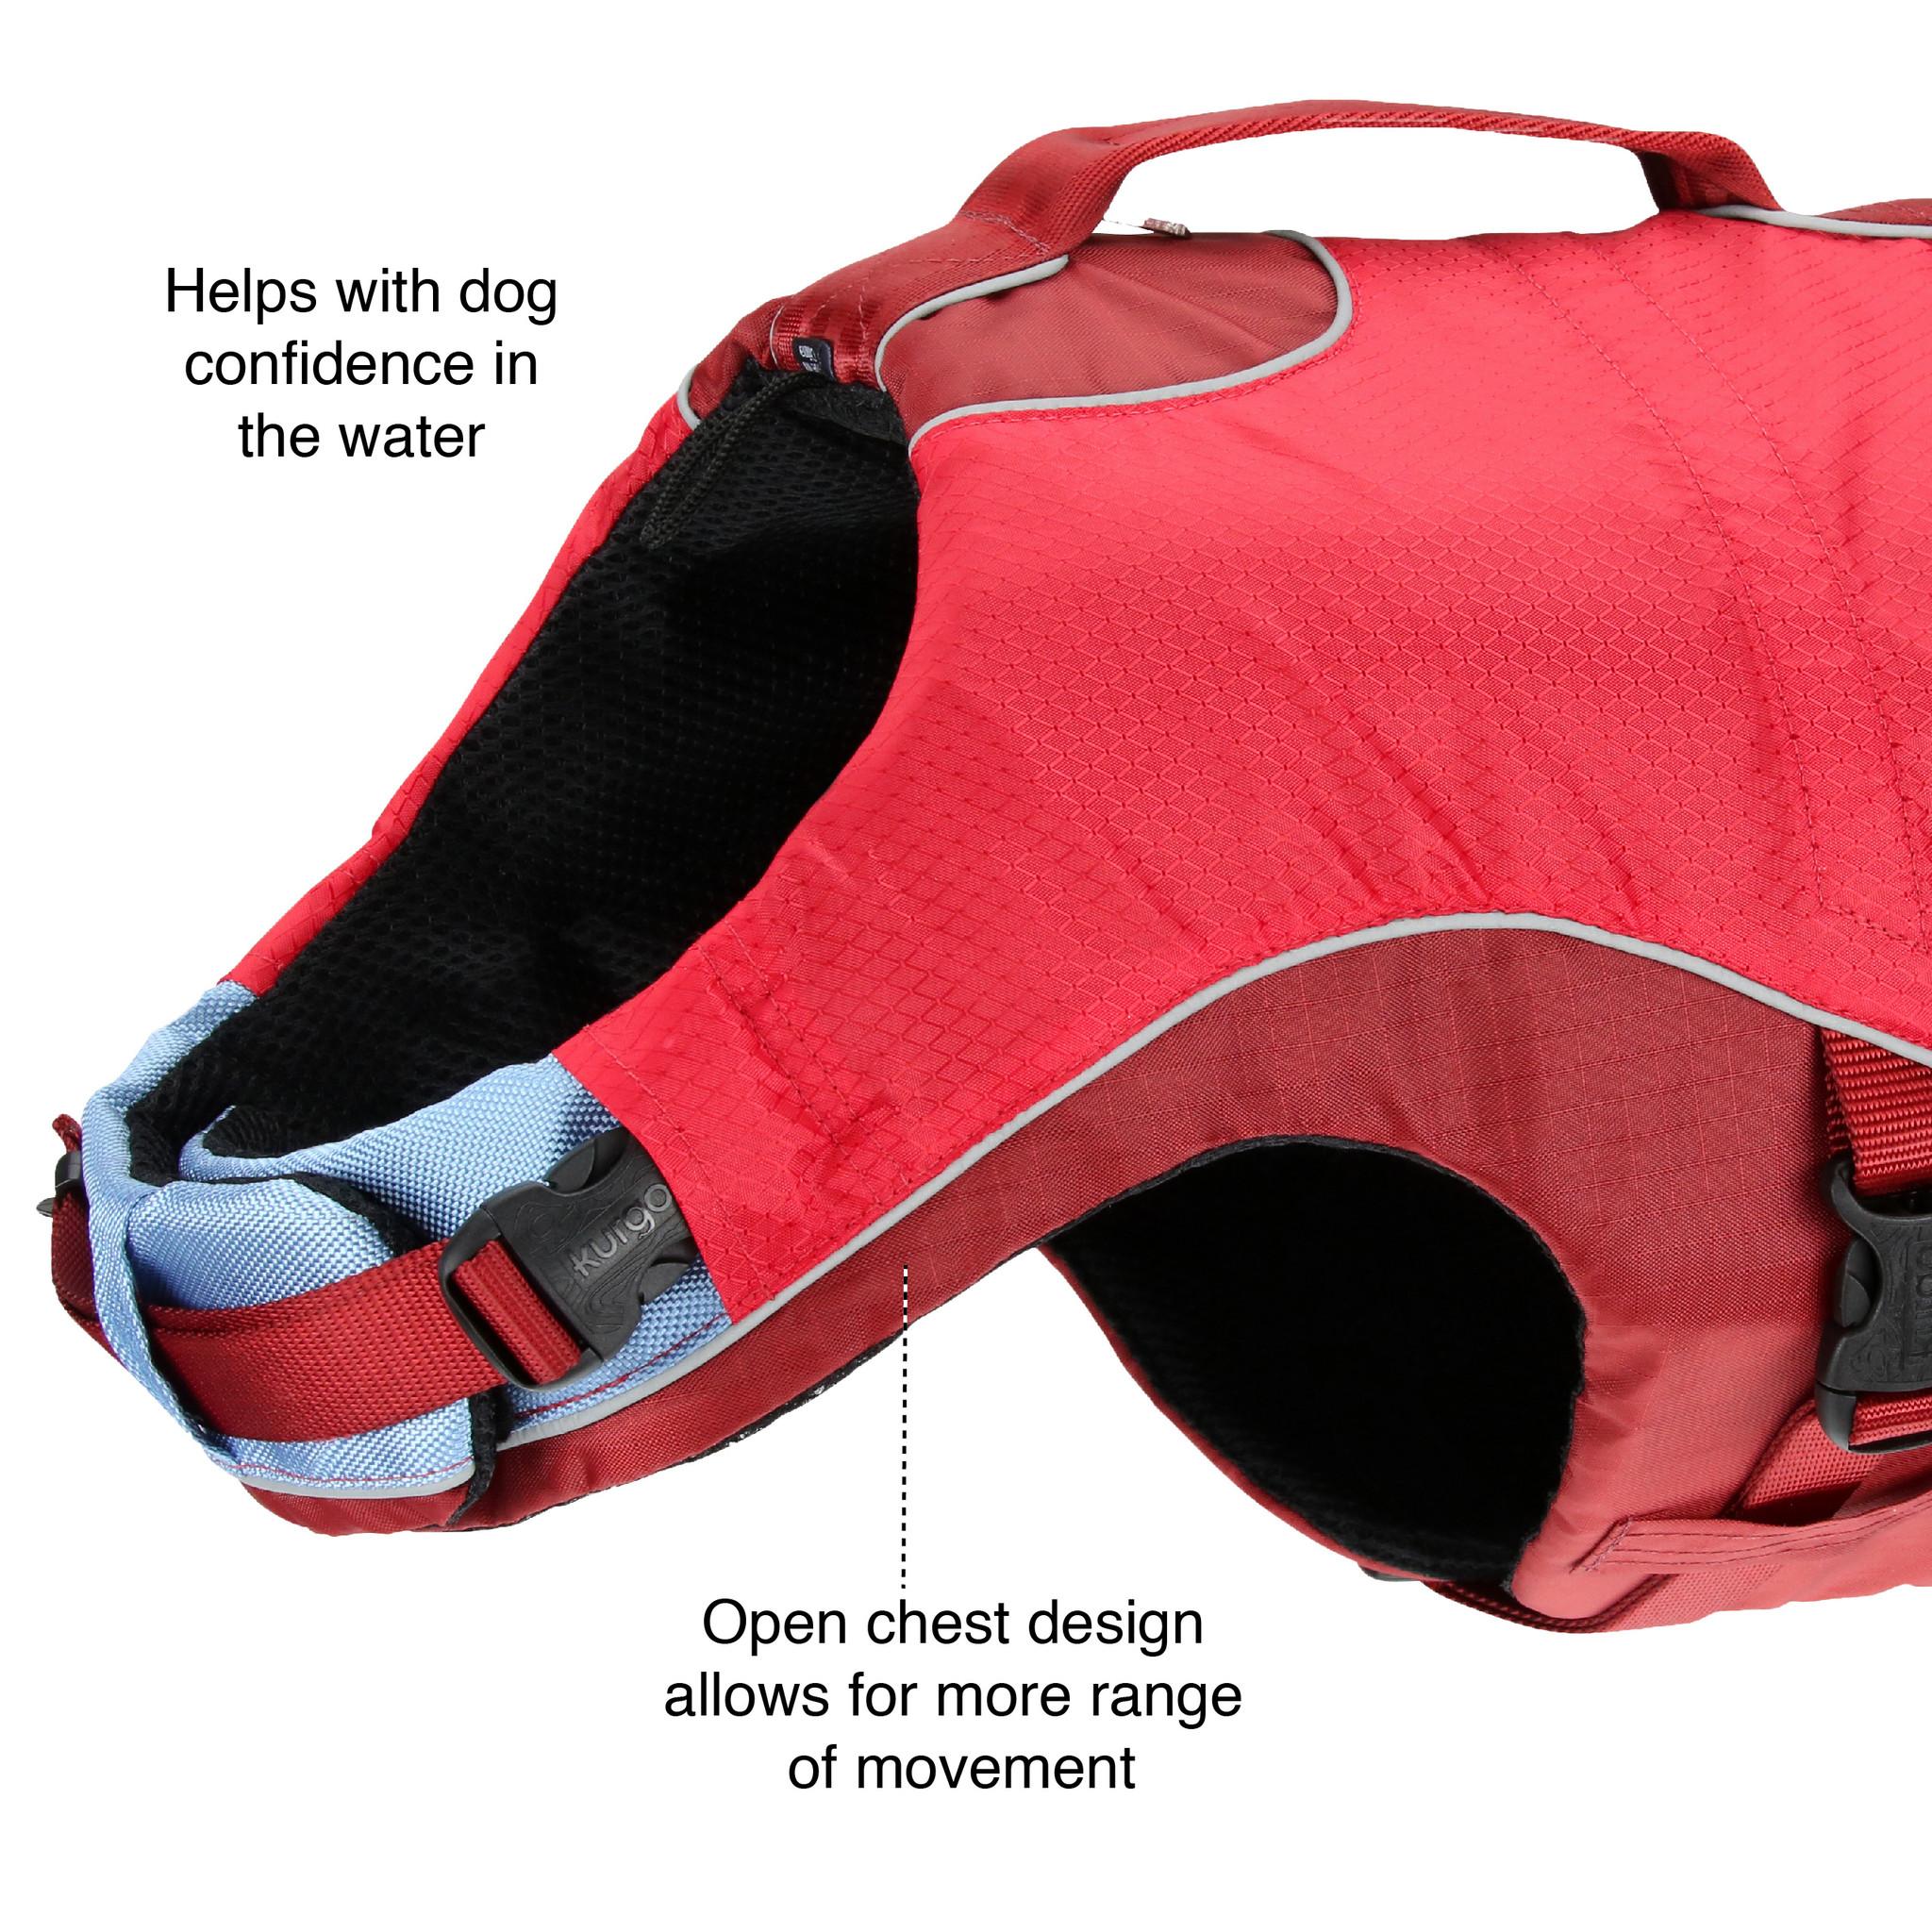 KURGO life jacket for dog features